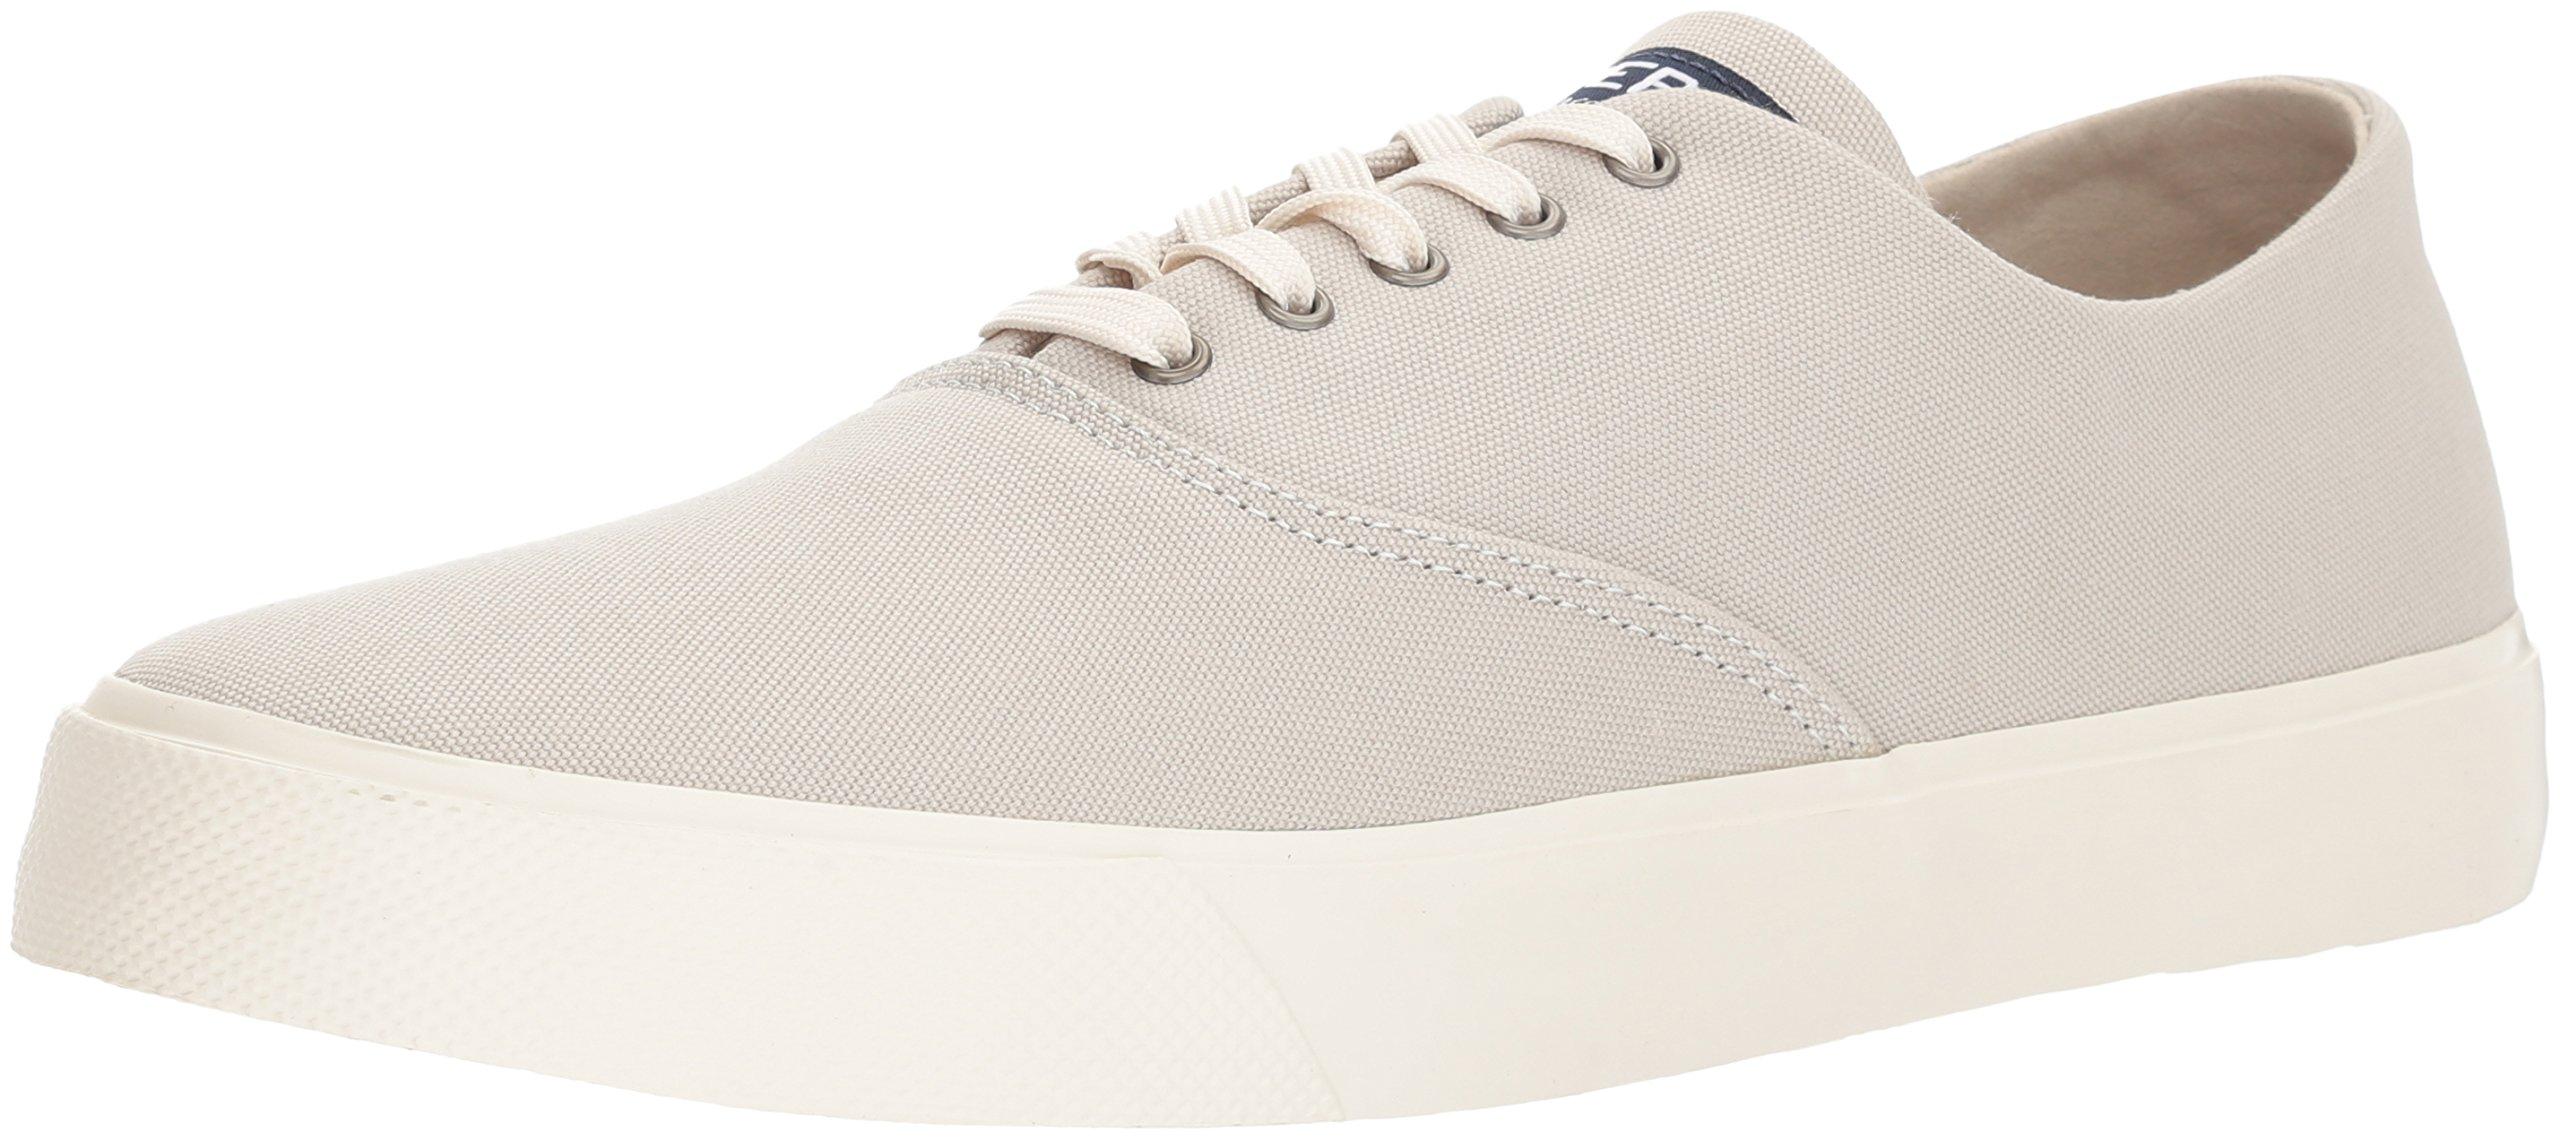 CVO Sneaker, Lt Grey